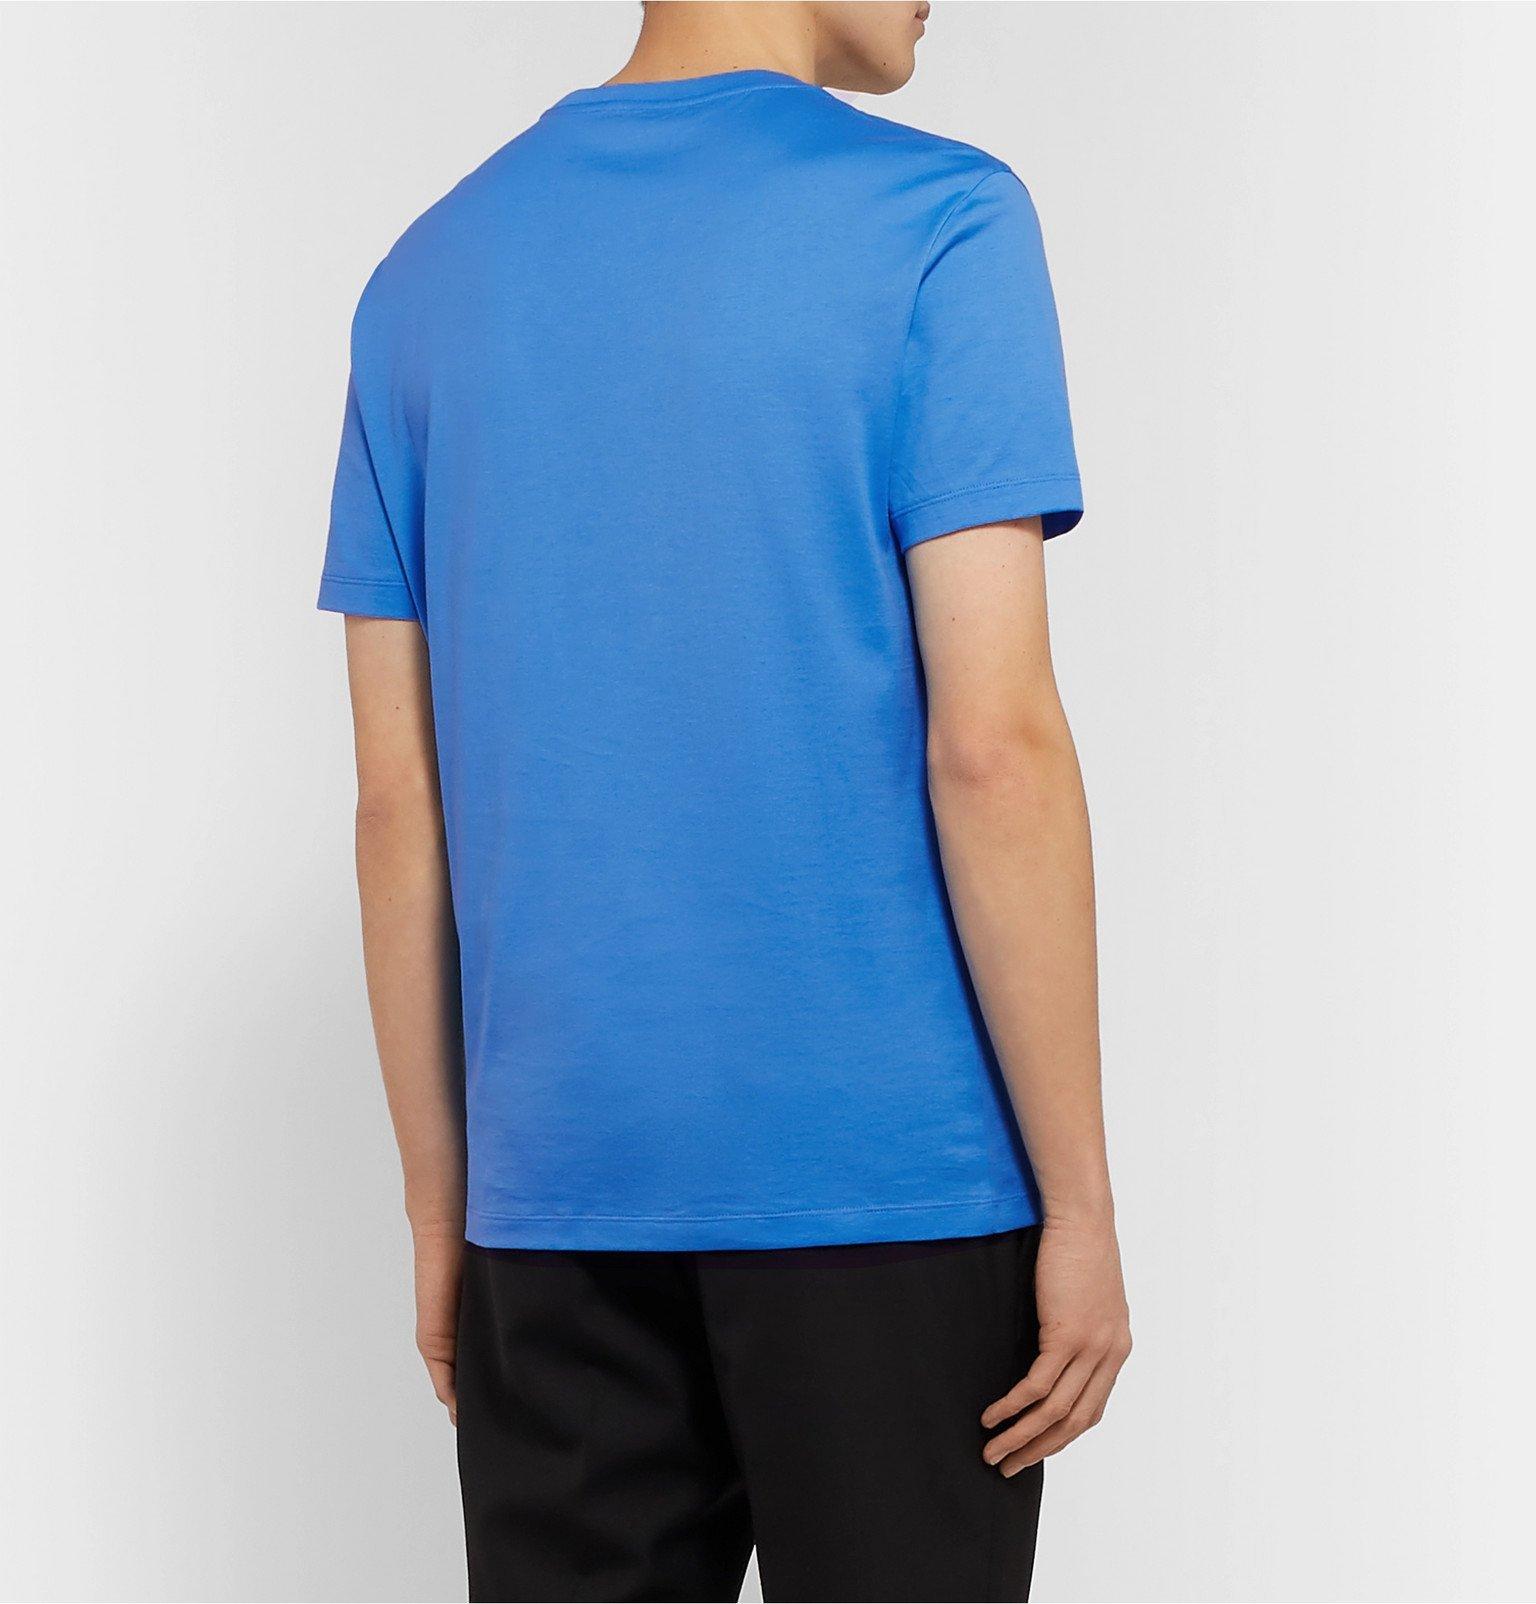 Versace - Printed Cotton-Jersey T-Shirt - Blue